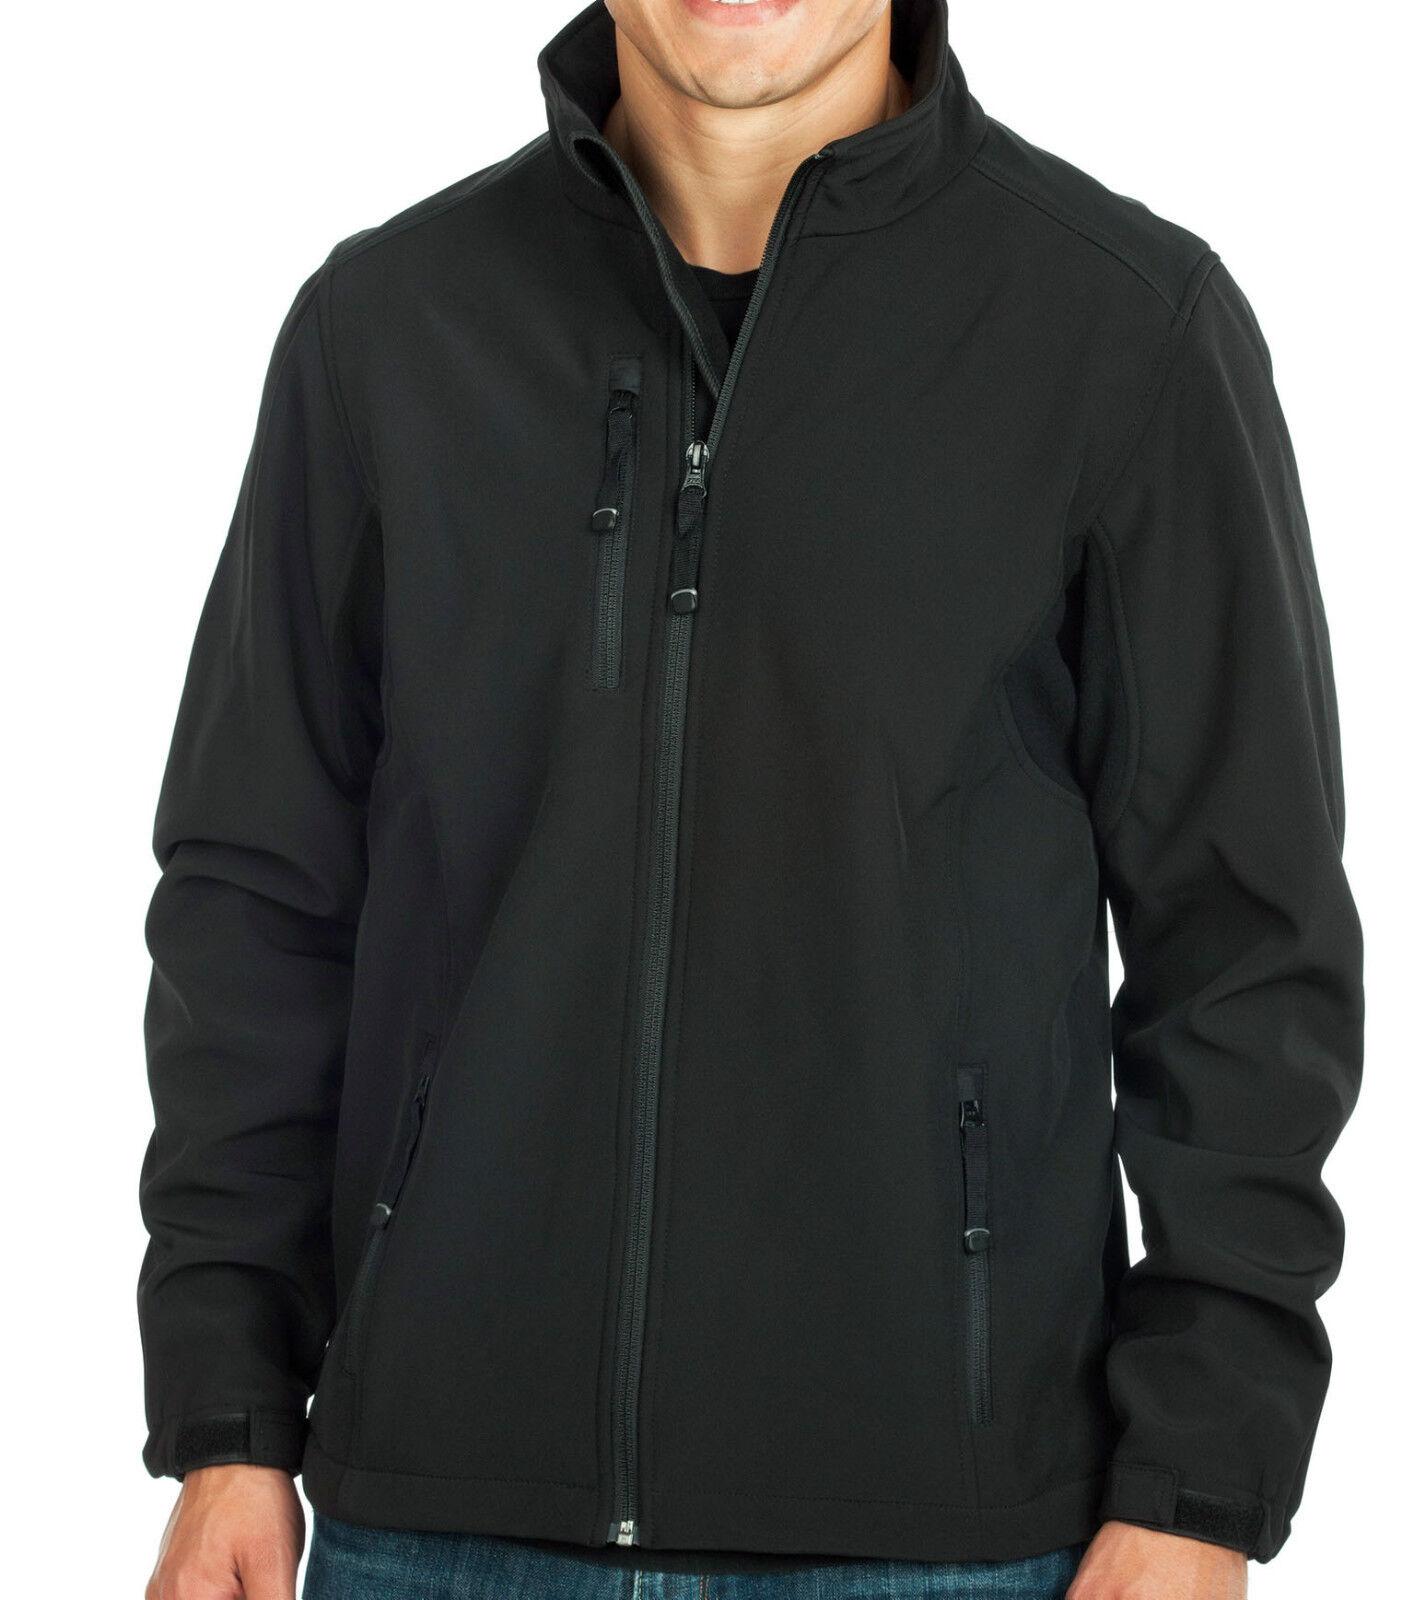 a3839a2005bad PEACHES PICK REALTREE XTRA HUNTER CAMO BLACK Soft Shell Active Jacket Mens  S-5XL